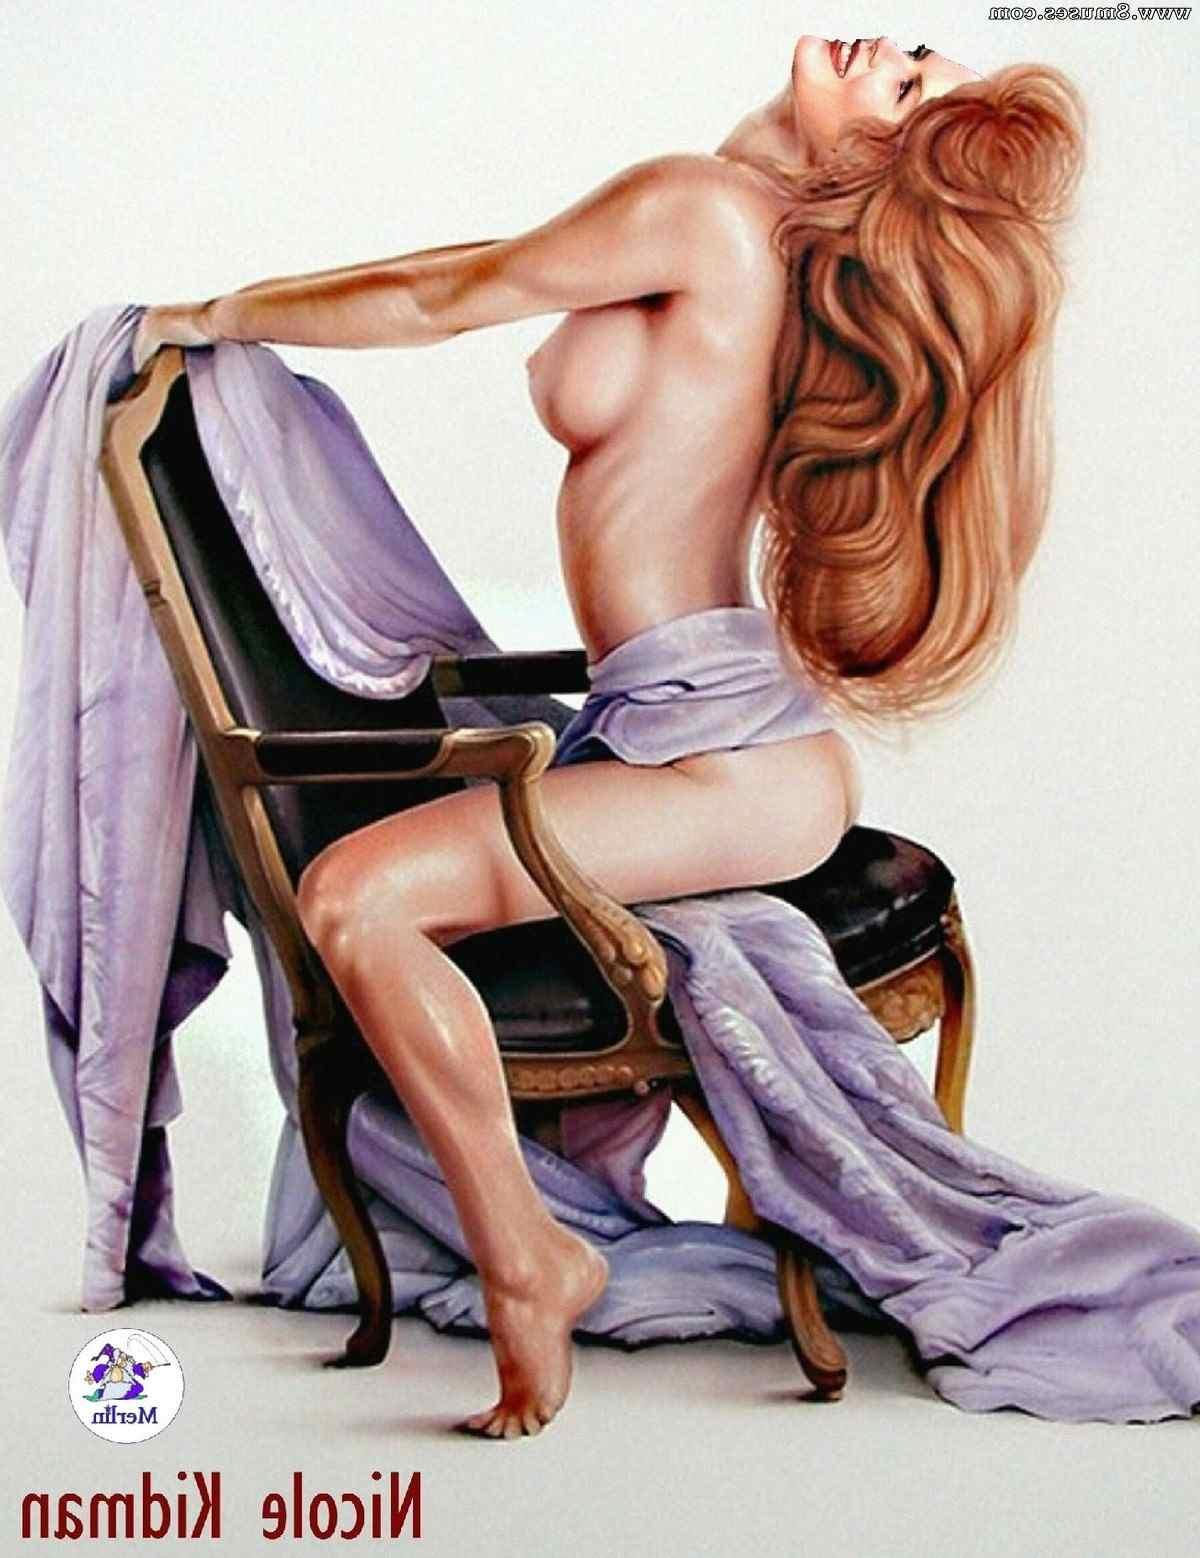 Fake-Celebrities-Sex-Pictures/Nicole-Kidman Nicole_Kidman__8muses_-_Sex_and_Porn_Comics_634.jpg